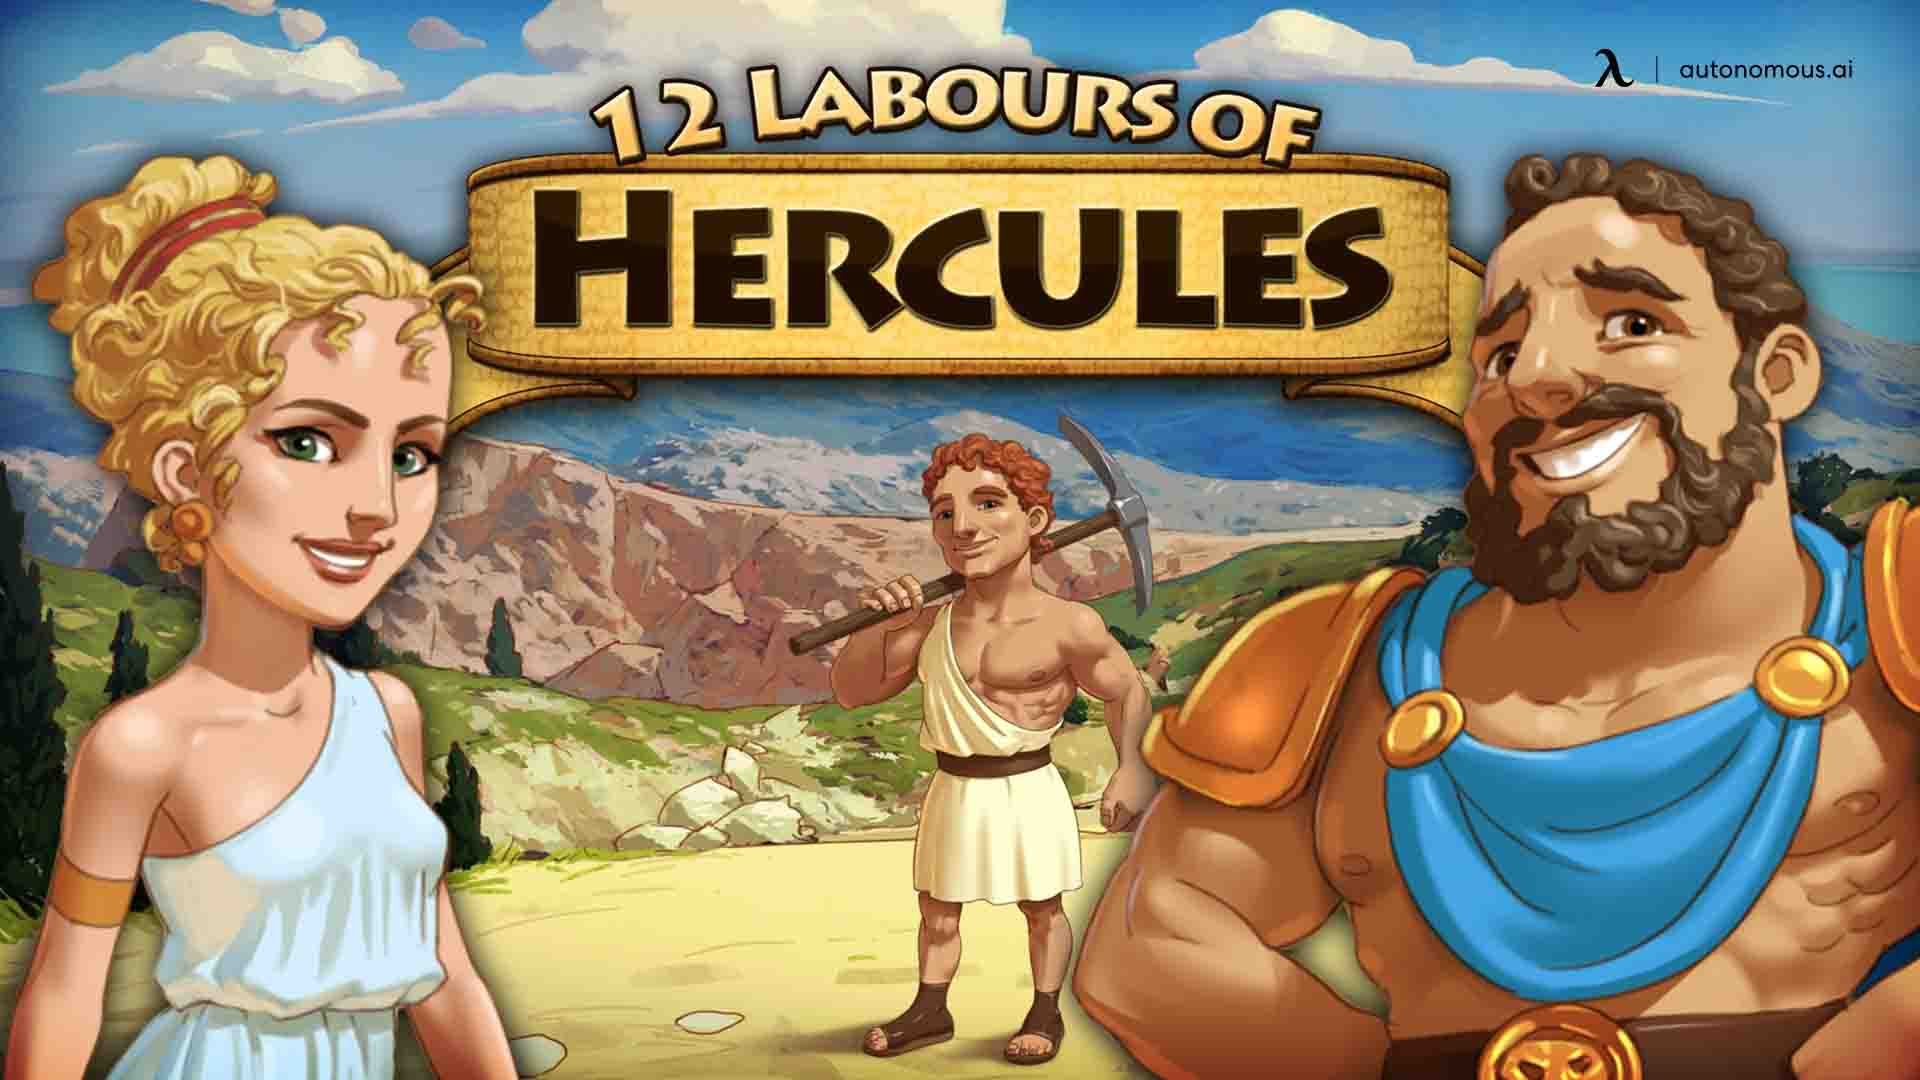 12 Labors of Hercules